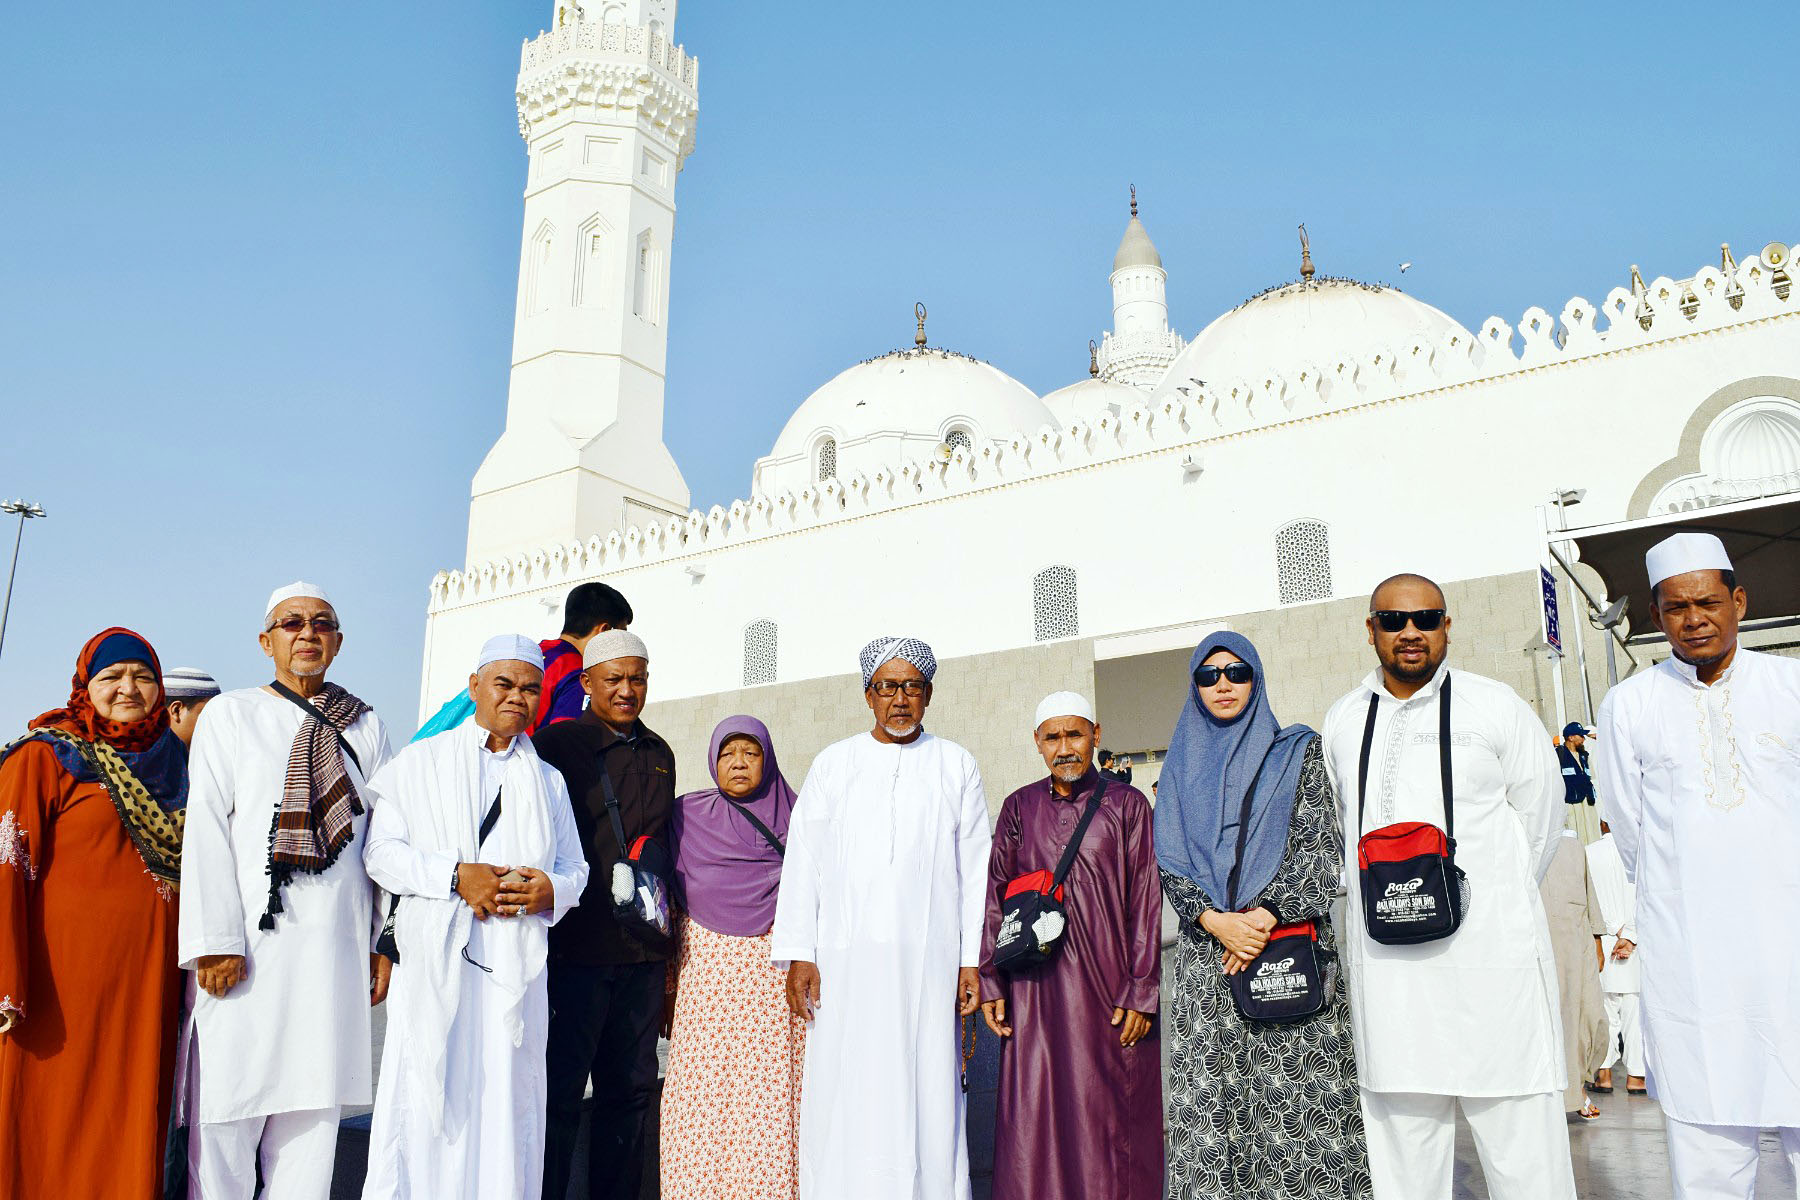 Tunai Ibadah Umrah Dengan Tenang Bersama Pakej Umrah Raza Holidays